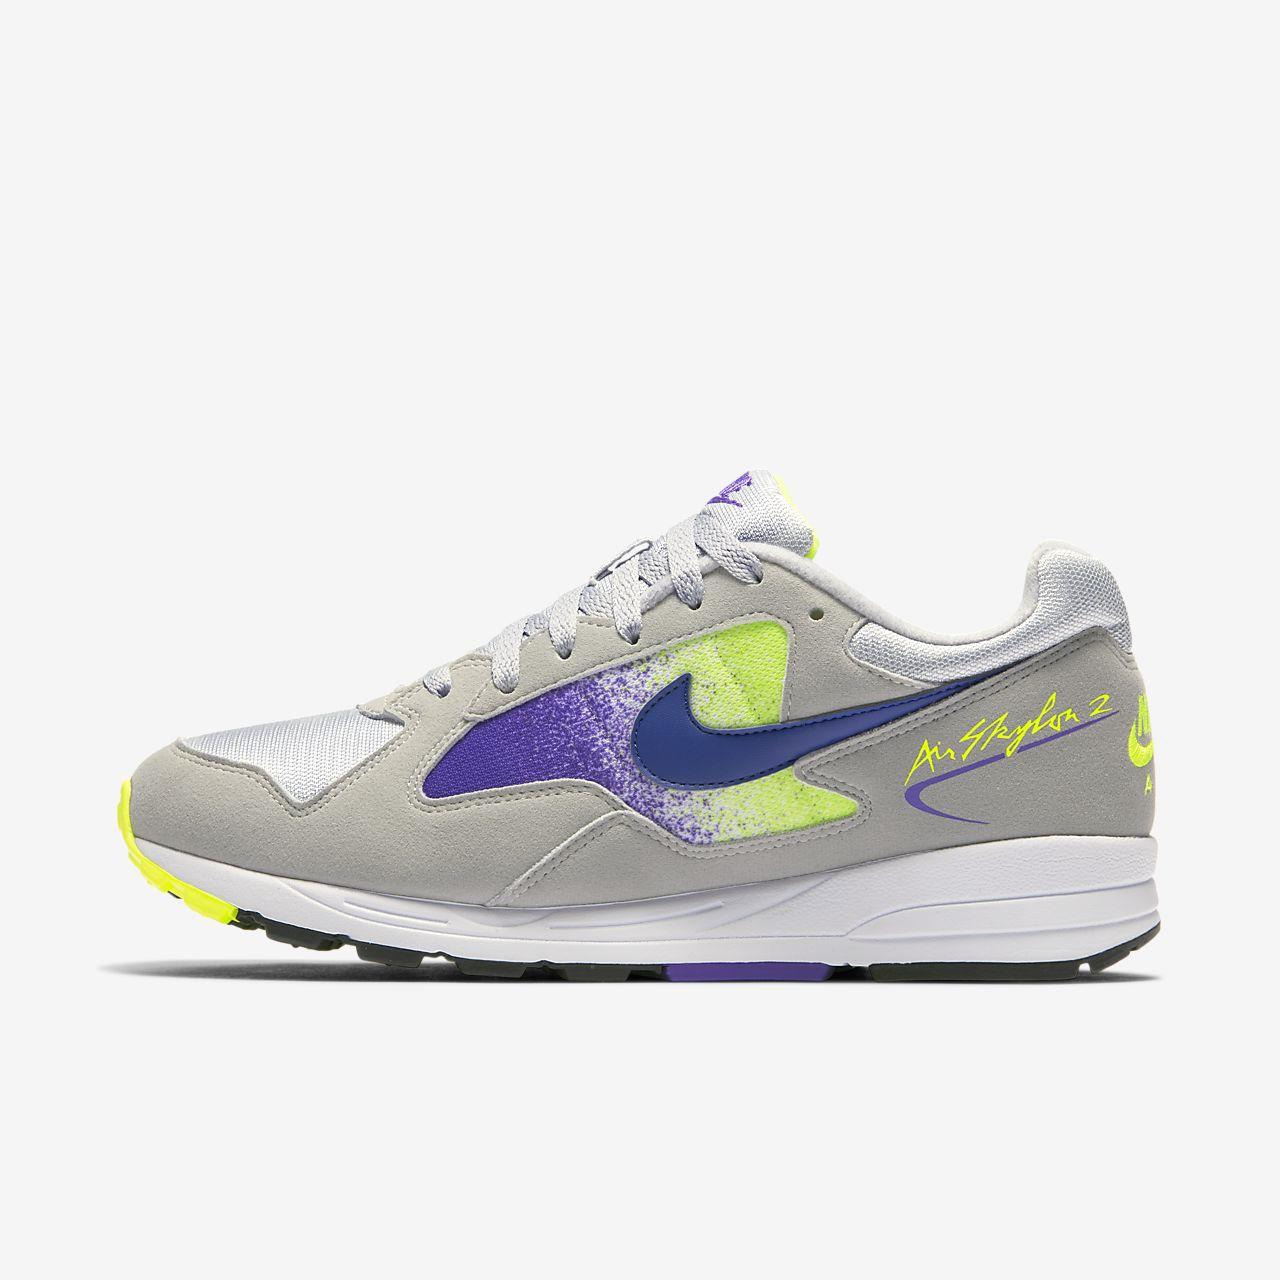 Nike Air Skylon II herenschoen